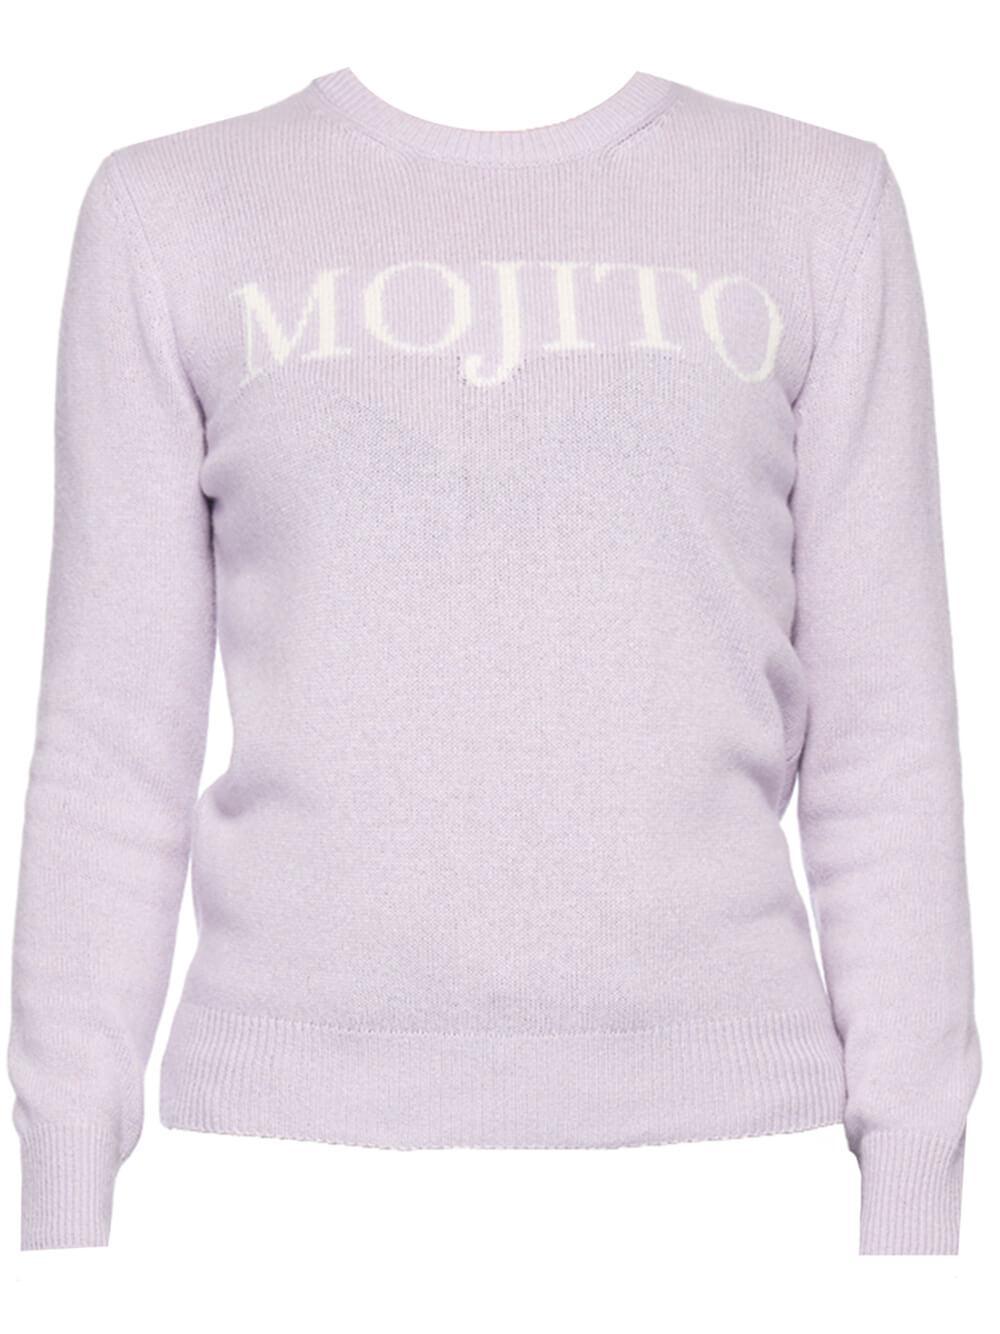 Mojito Sweater Item # F13587-01381-MOJ